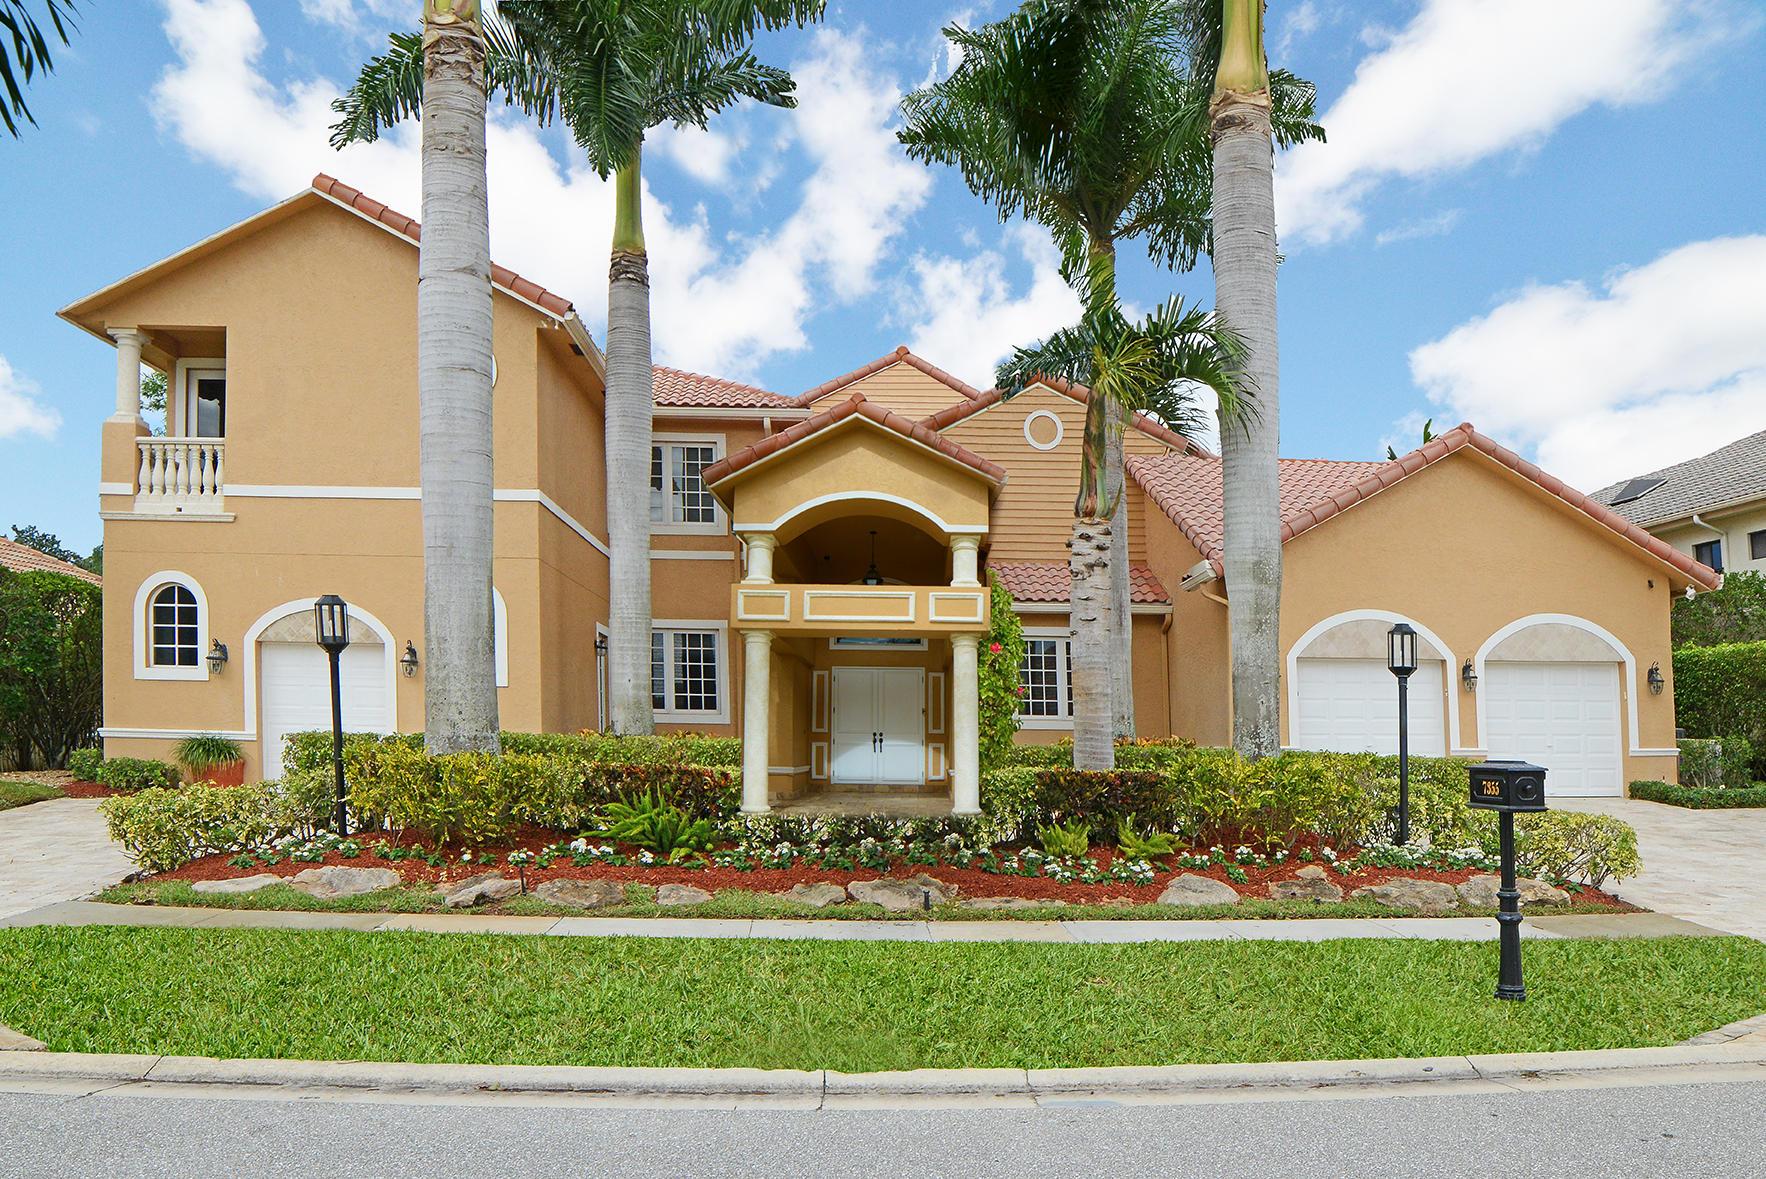 Photo of 7355 Mandarin Drive, Boca Raton, FL 33433